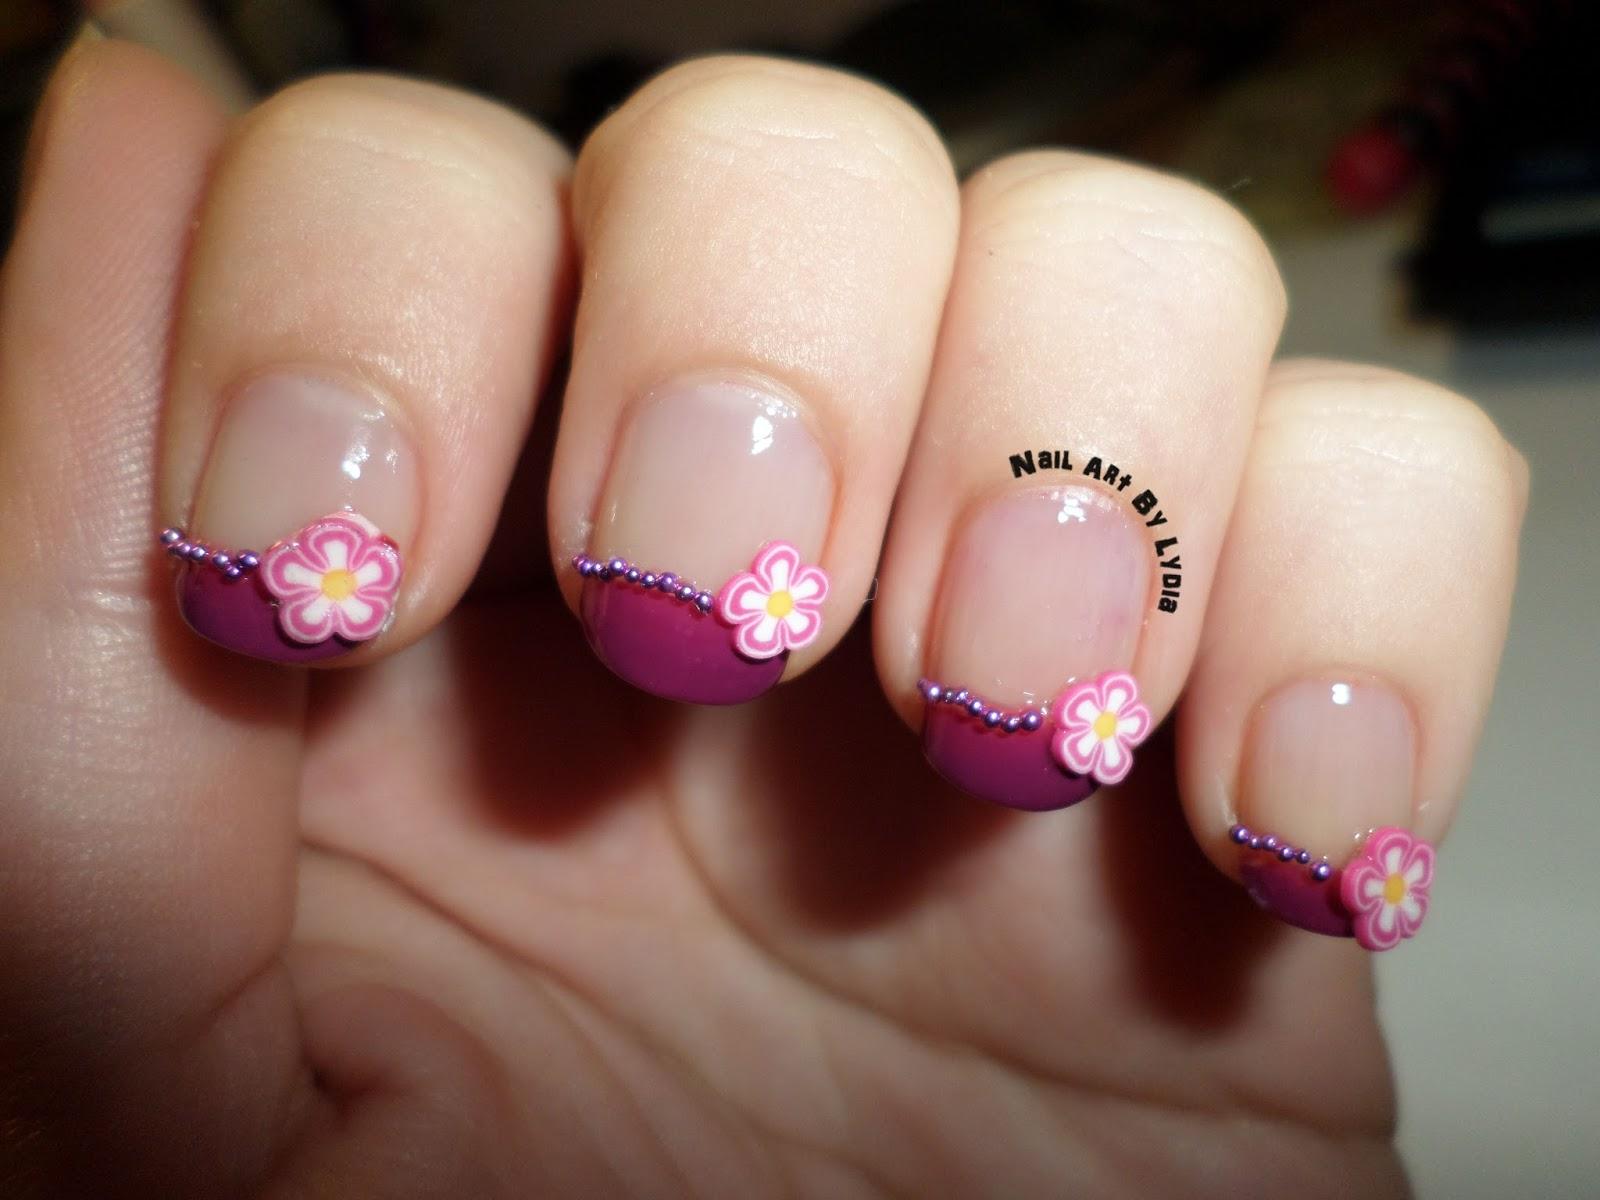 Nail art by lydia reto colores y t cnicas manicura - Manicura francesa colores ...